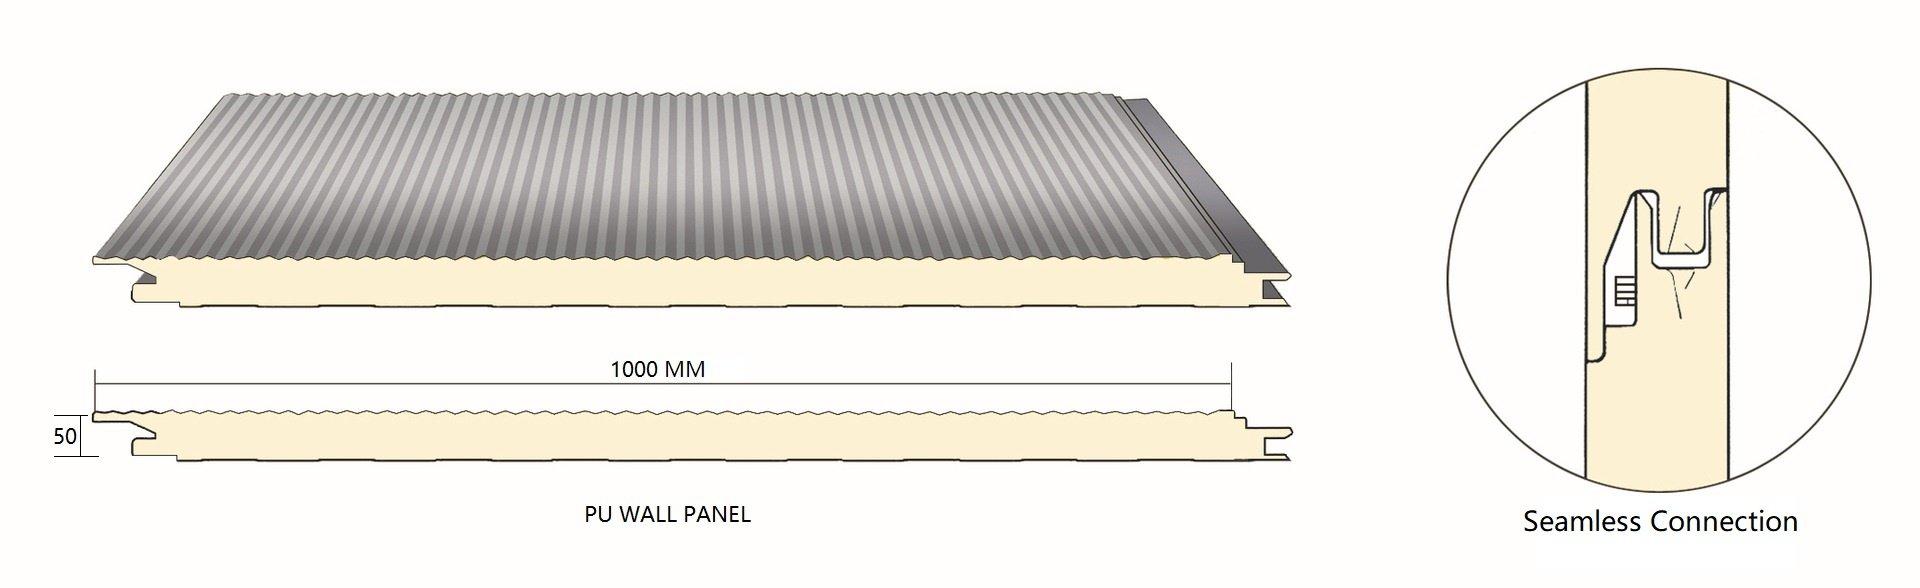 PU wall panel-BRDECO